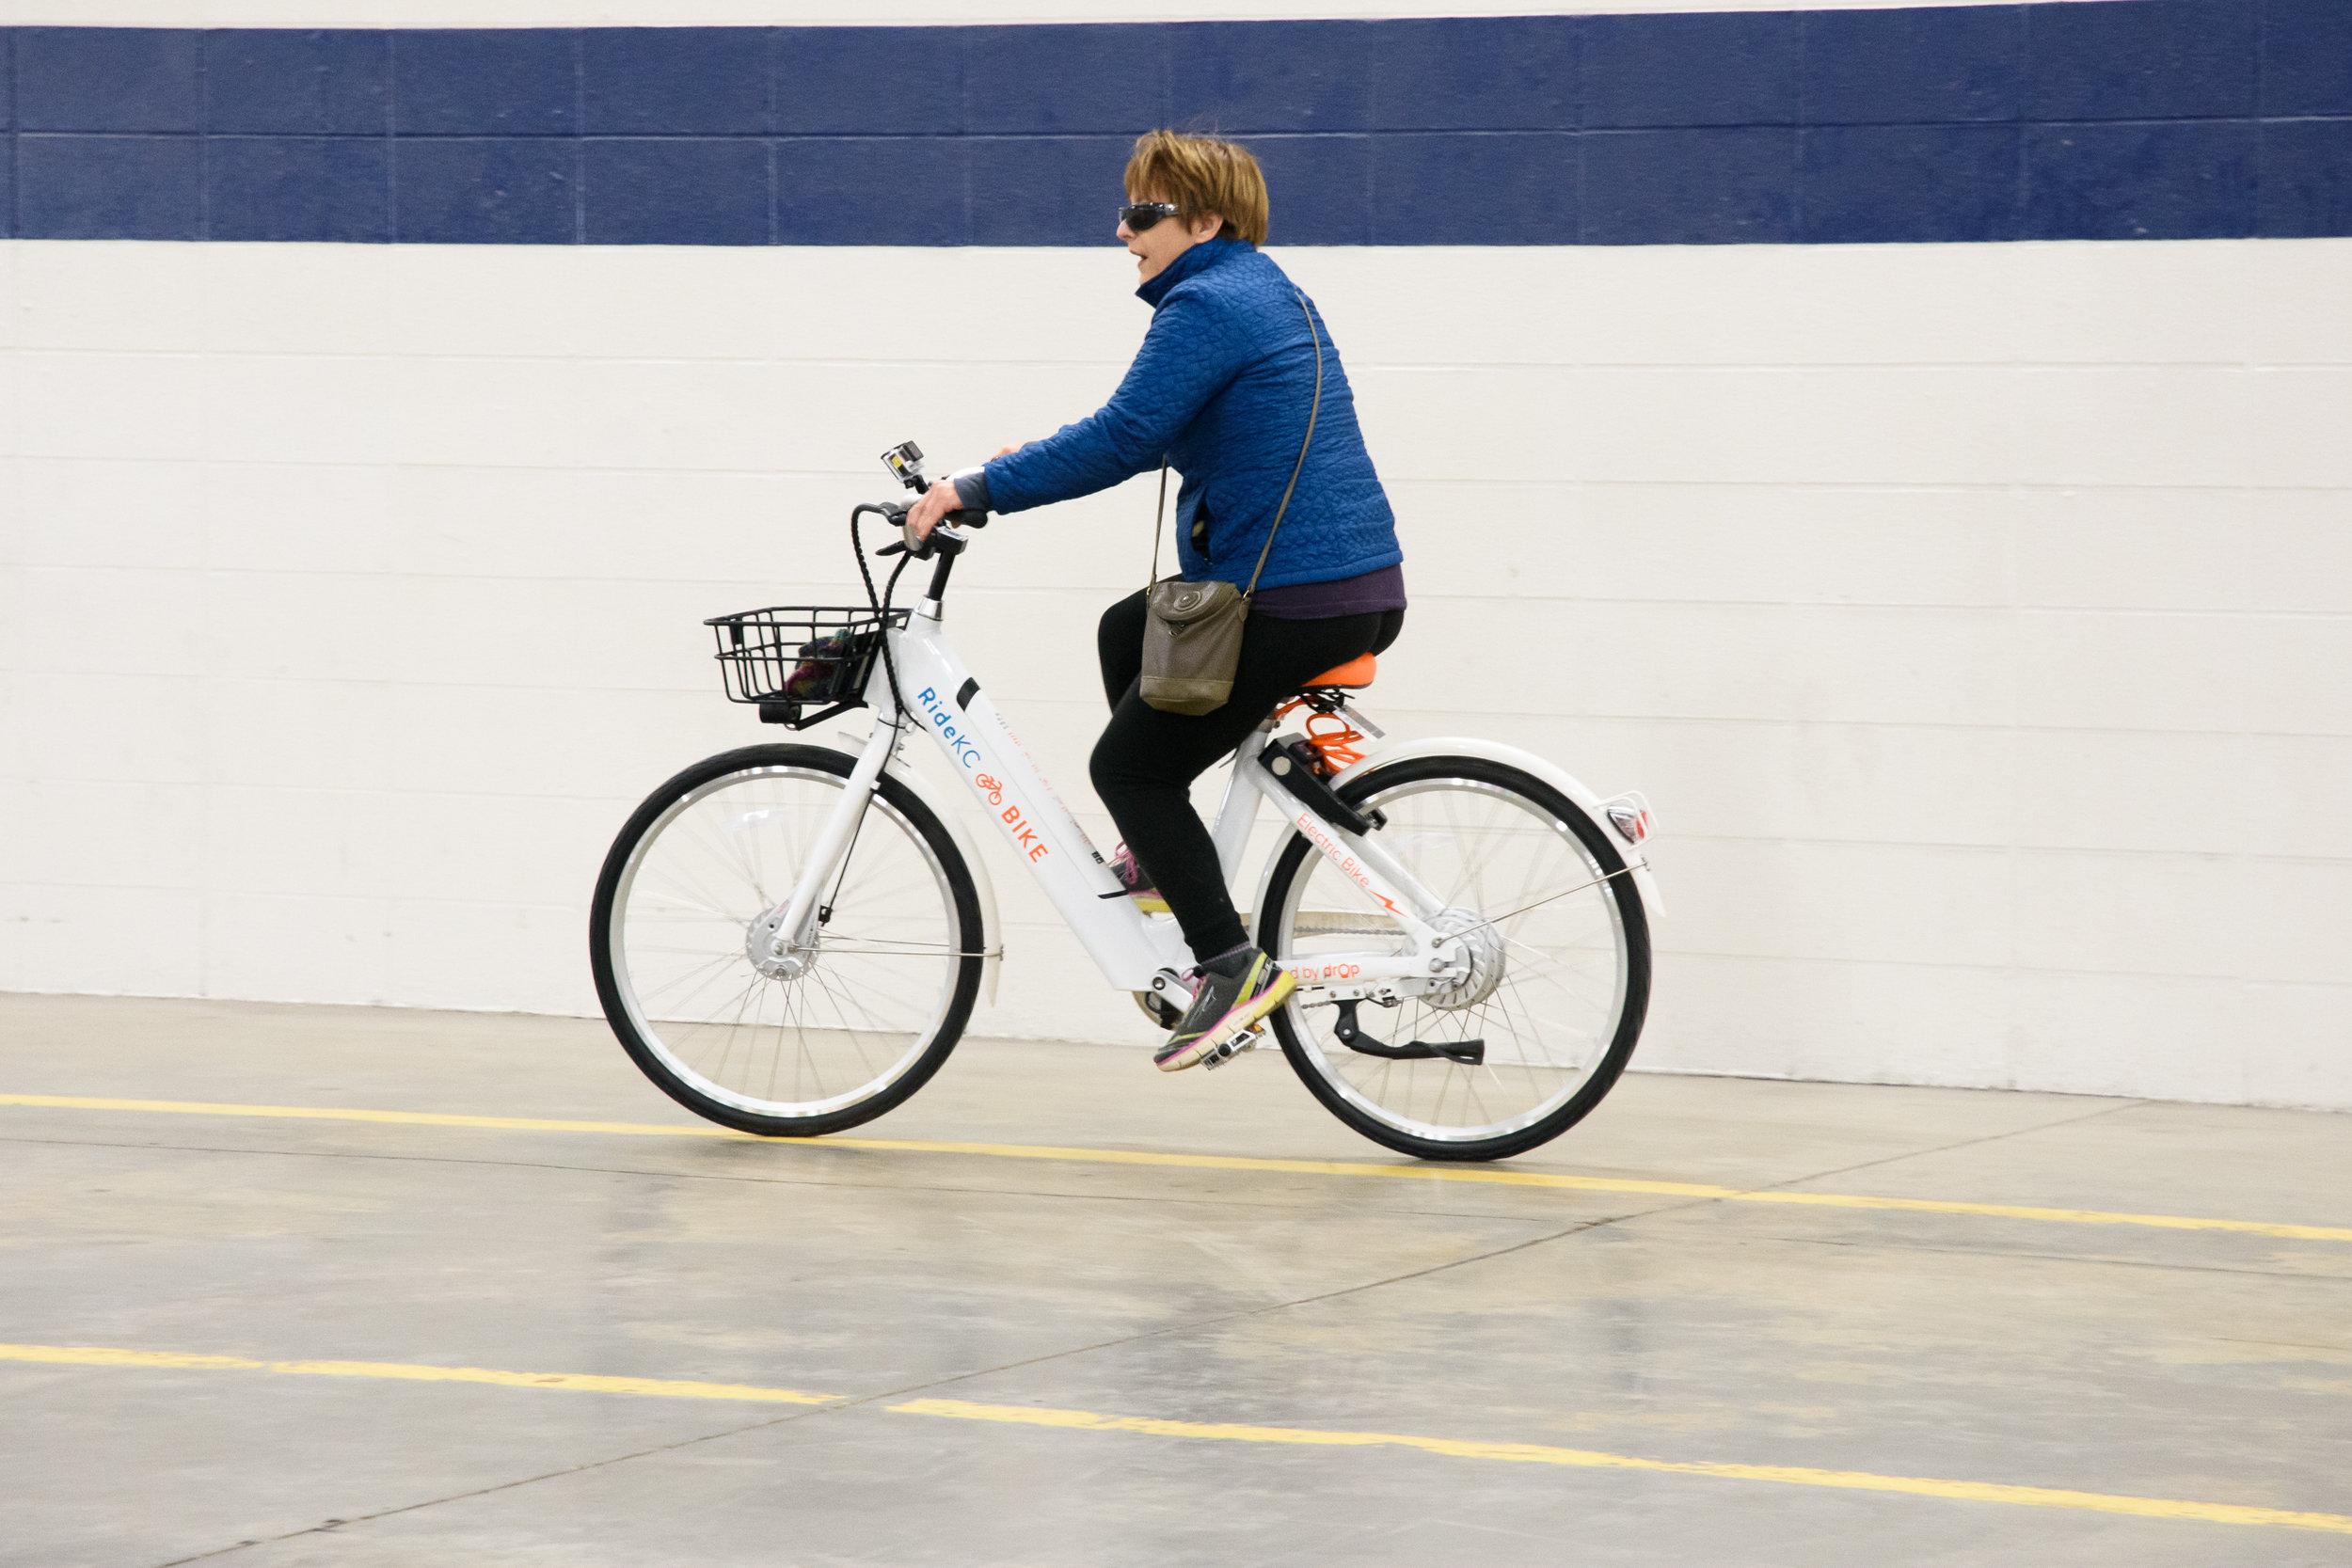 ridekc-bike-launch-event_46111563762_o.jpg